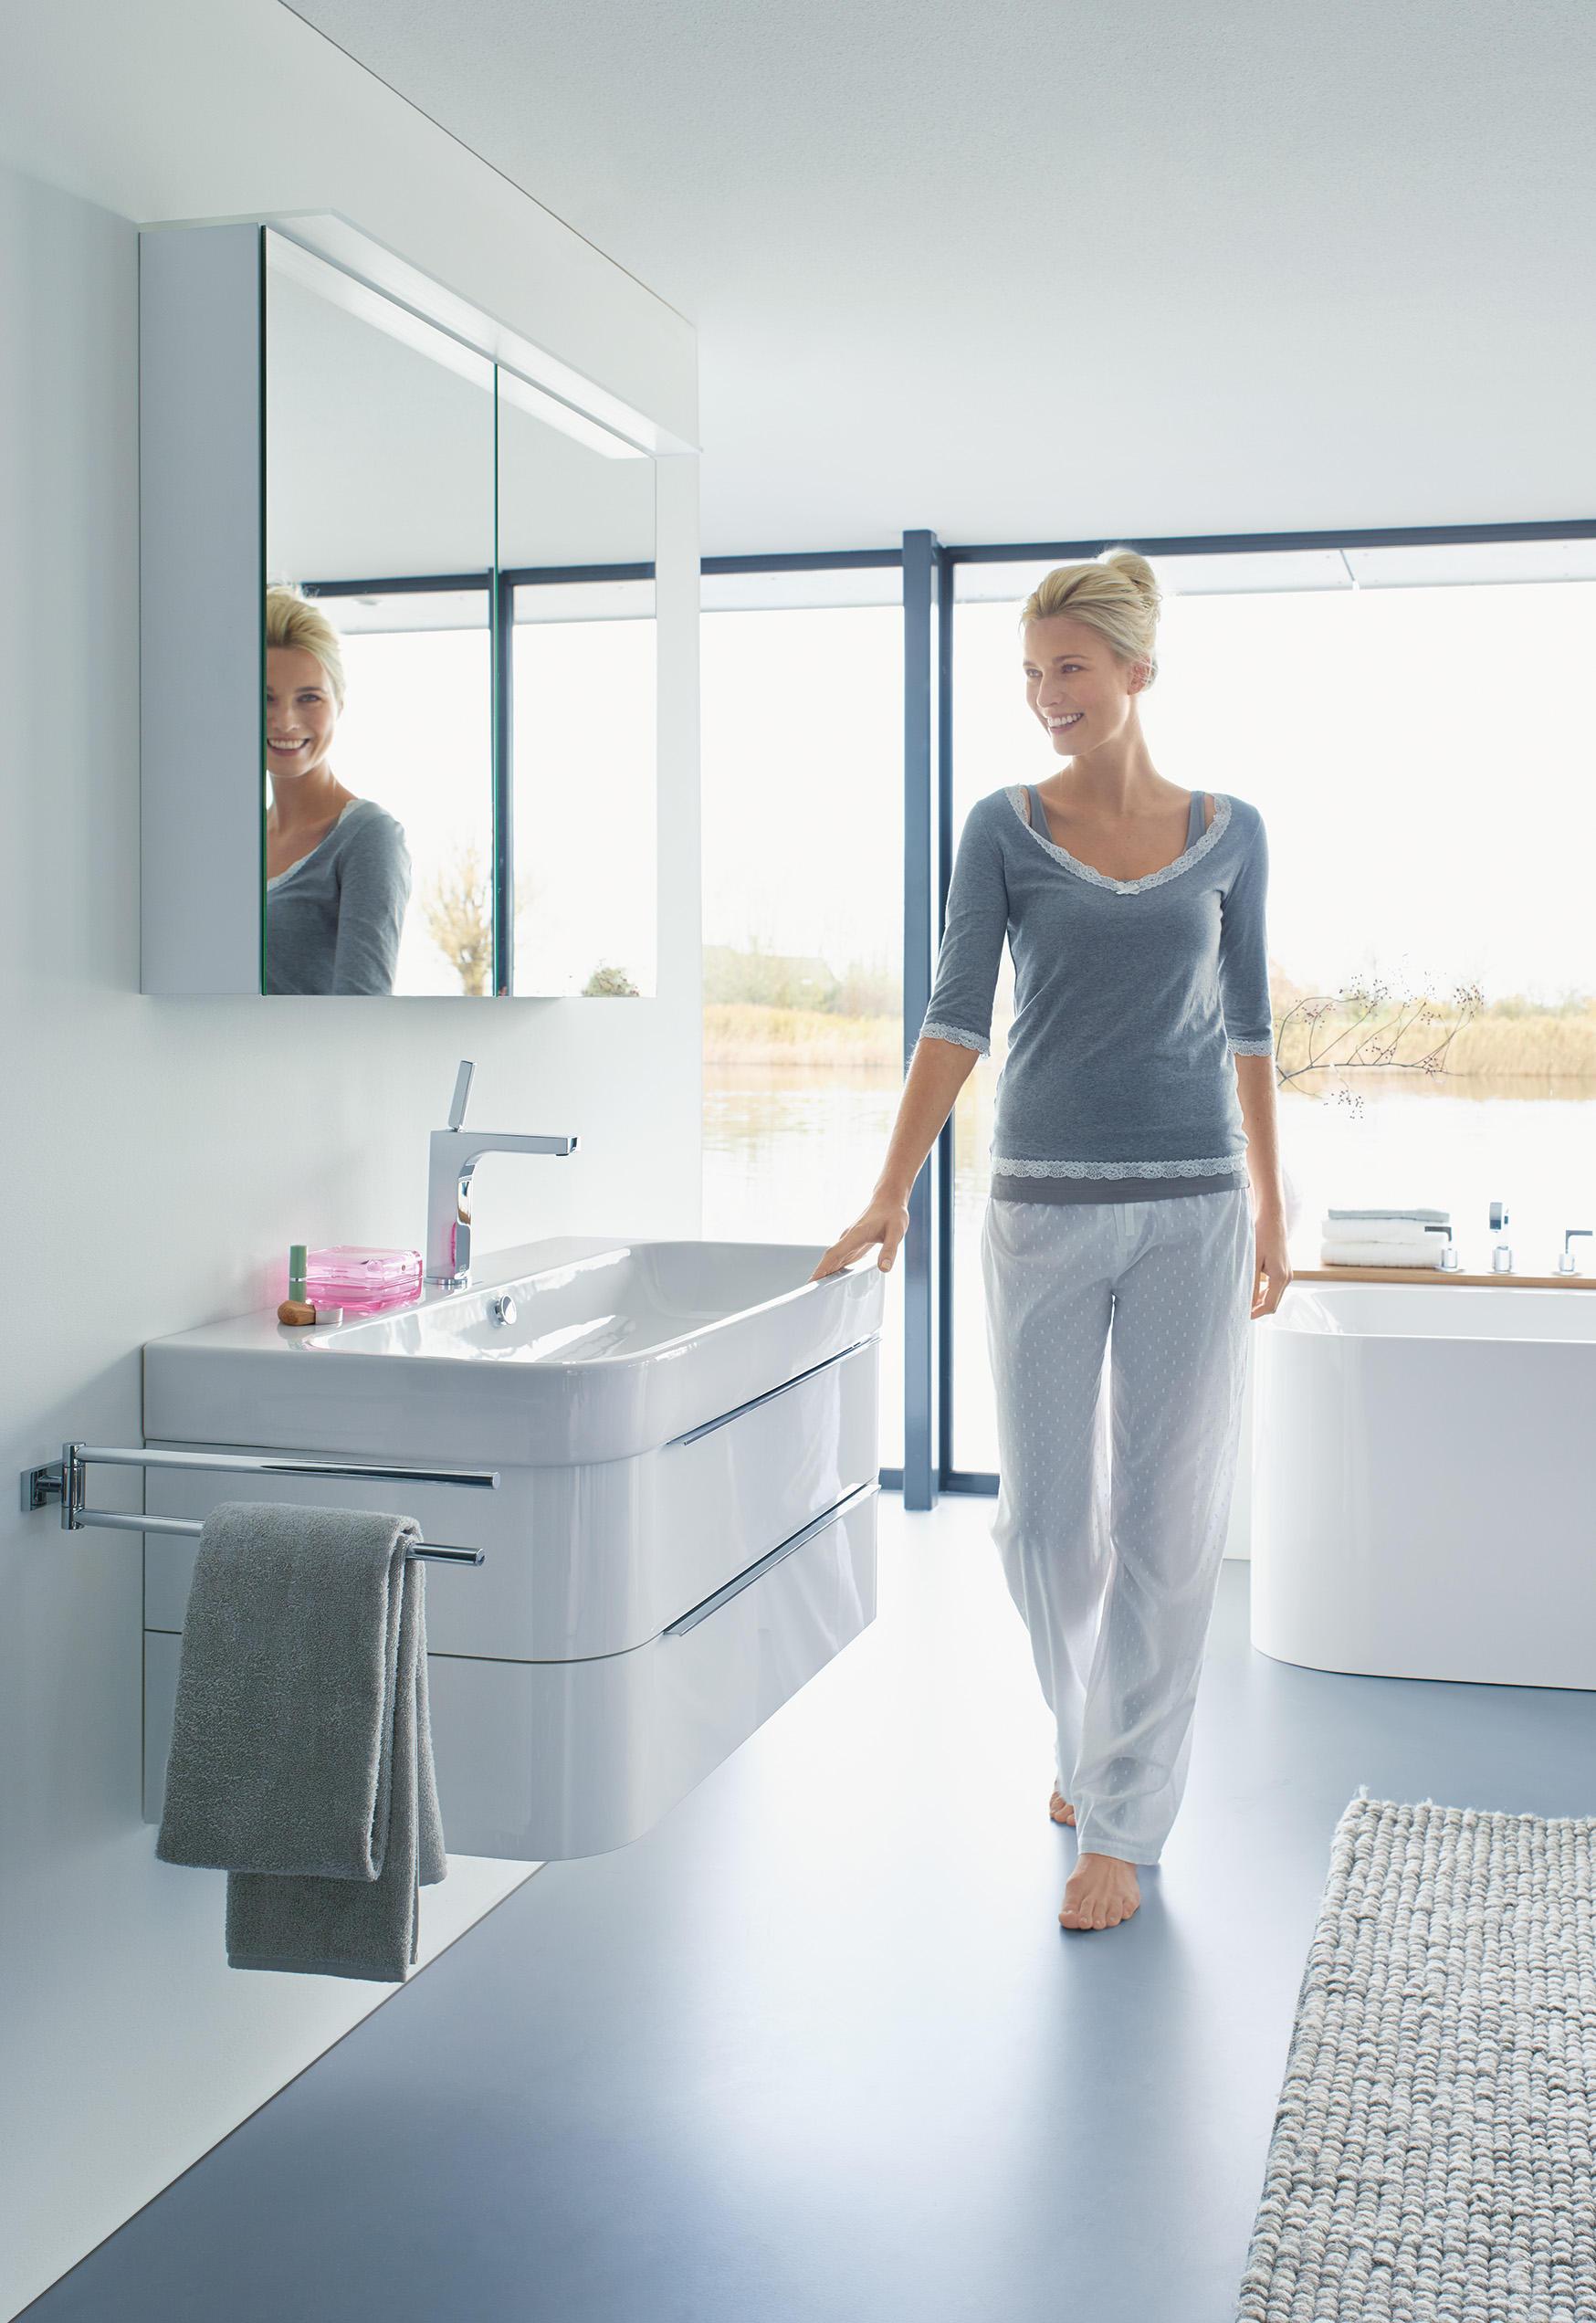 roman decorations vanity beautiful pedestal with areas washing duravit starck basin sink timelessly bath